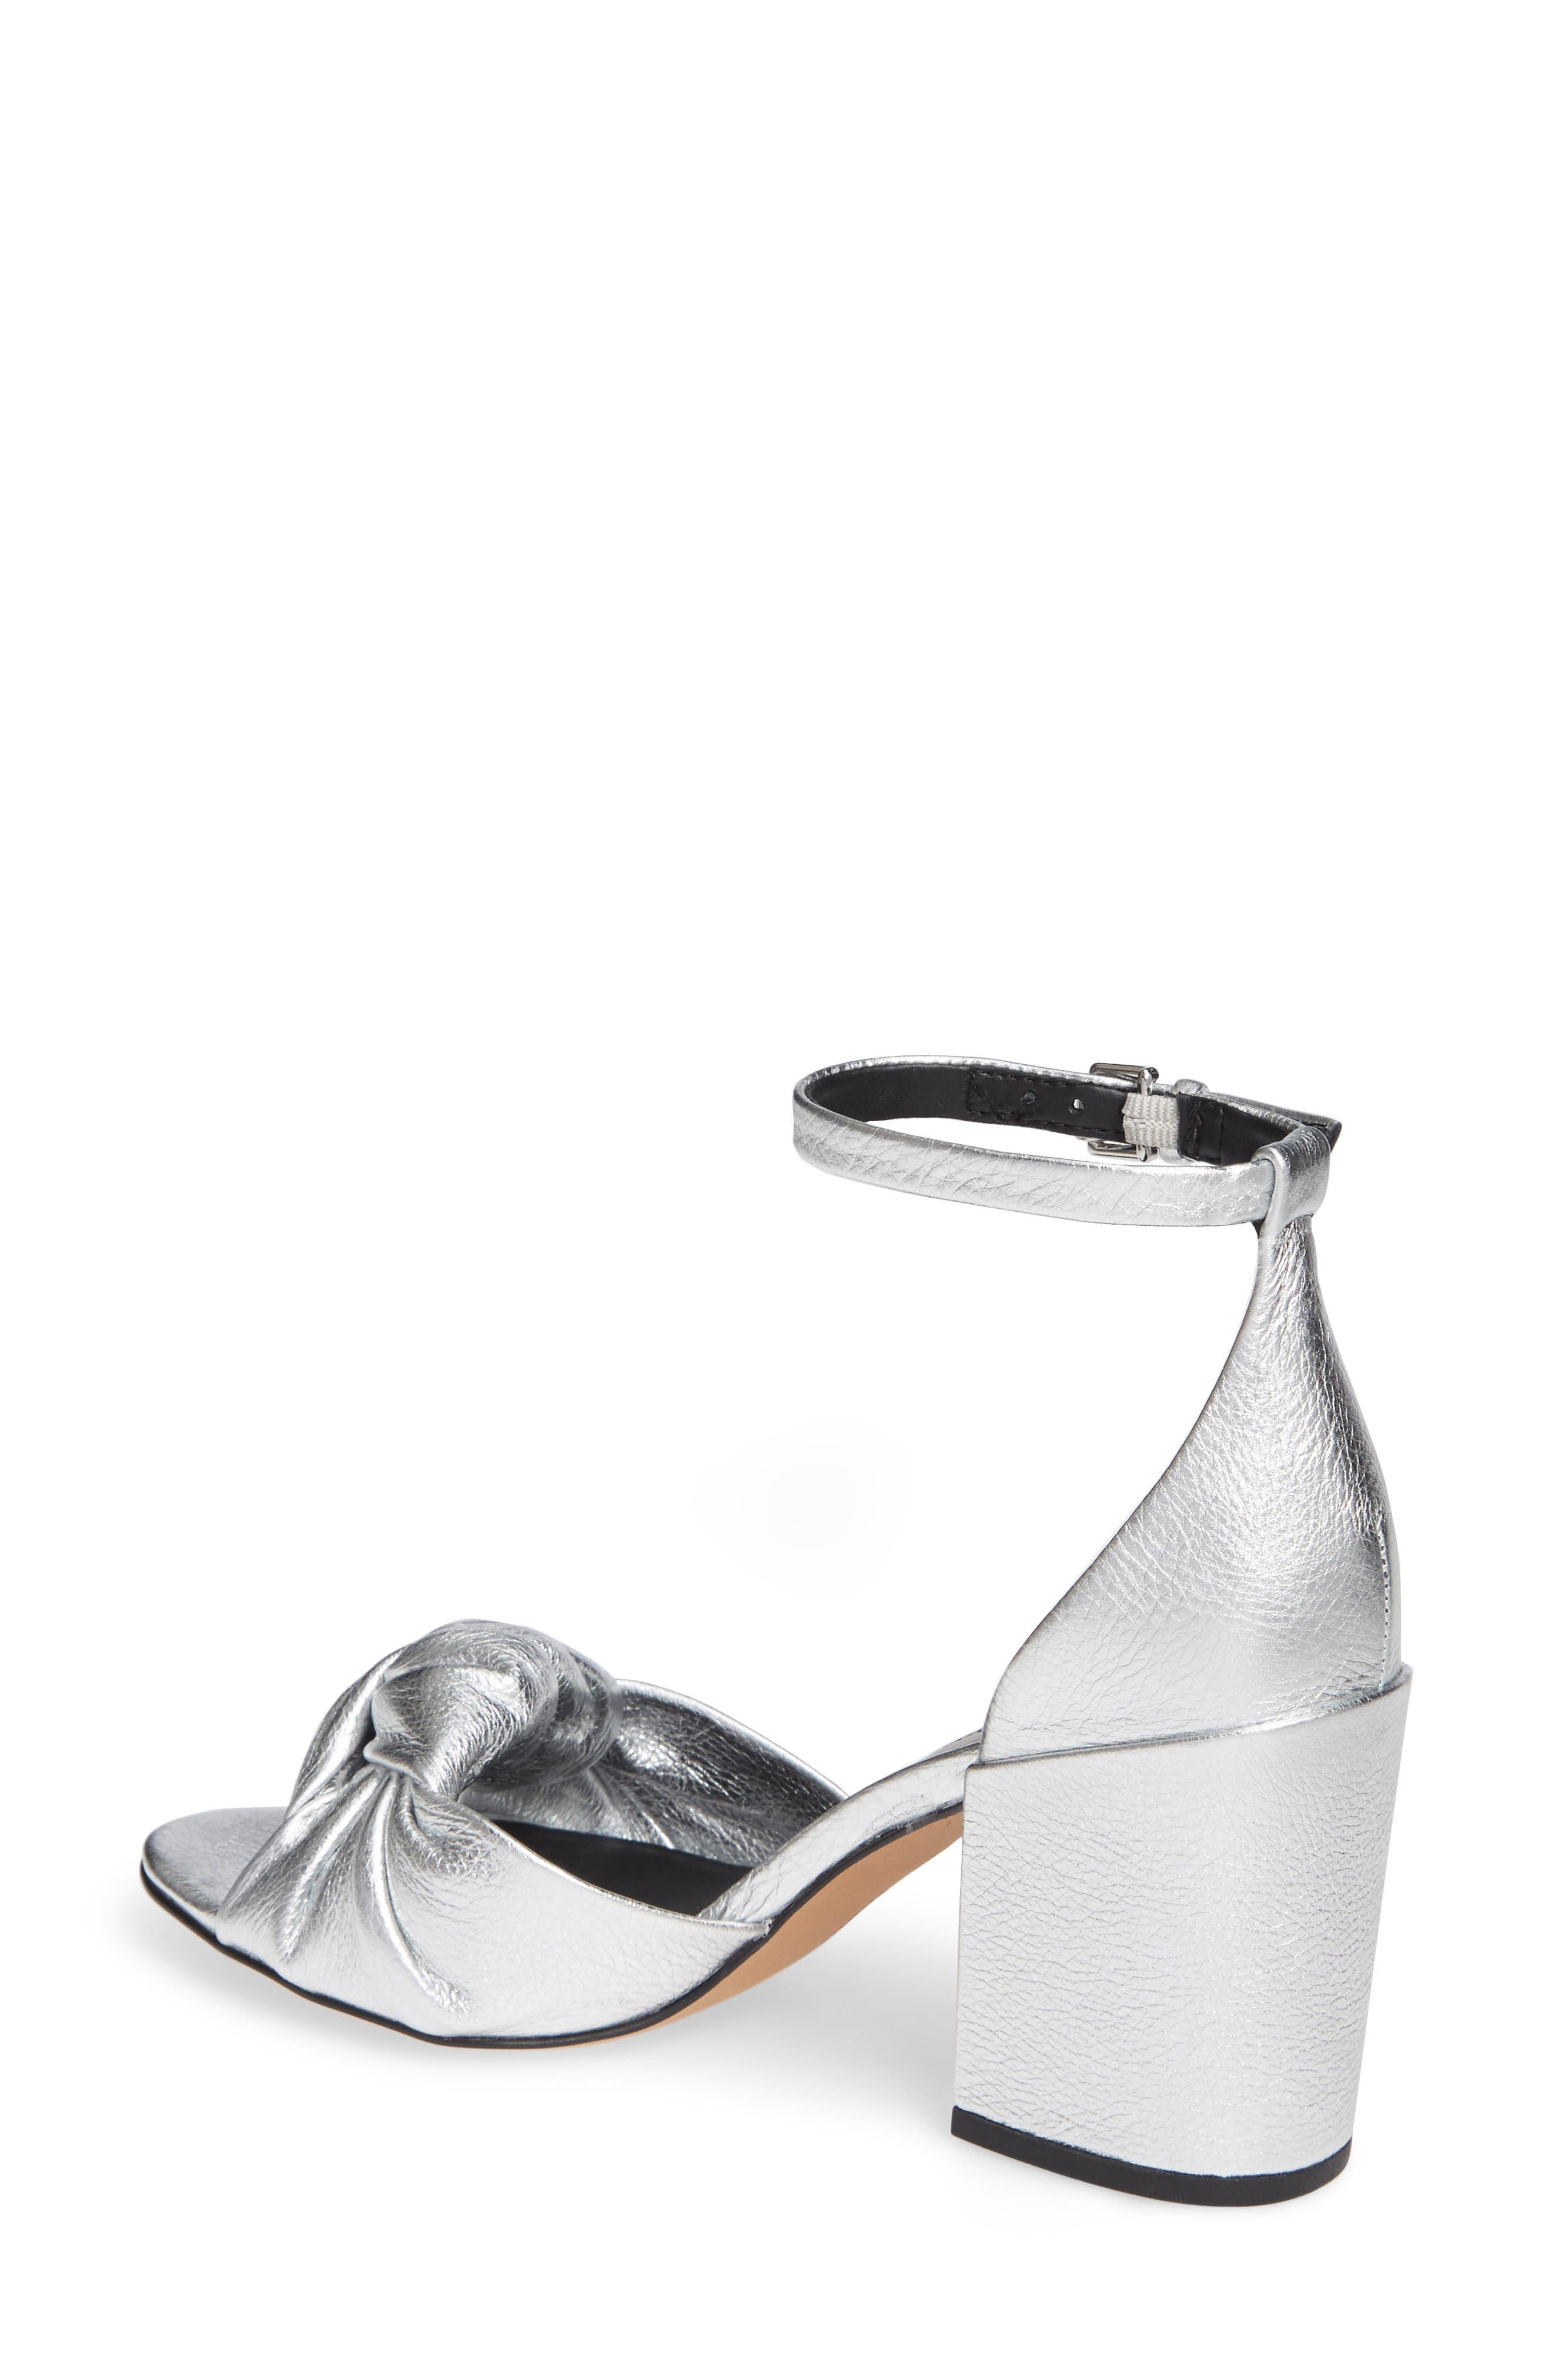 REBECCA MINKOFF, Capriana Ankle Strap Sandal, Alternate thumbnail 2, color, SILVER LEATHER